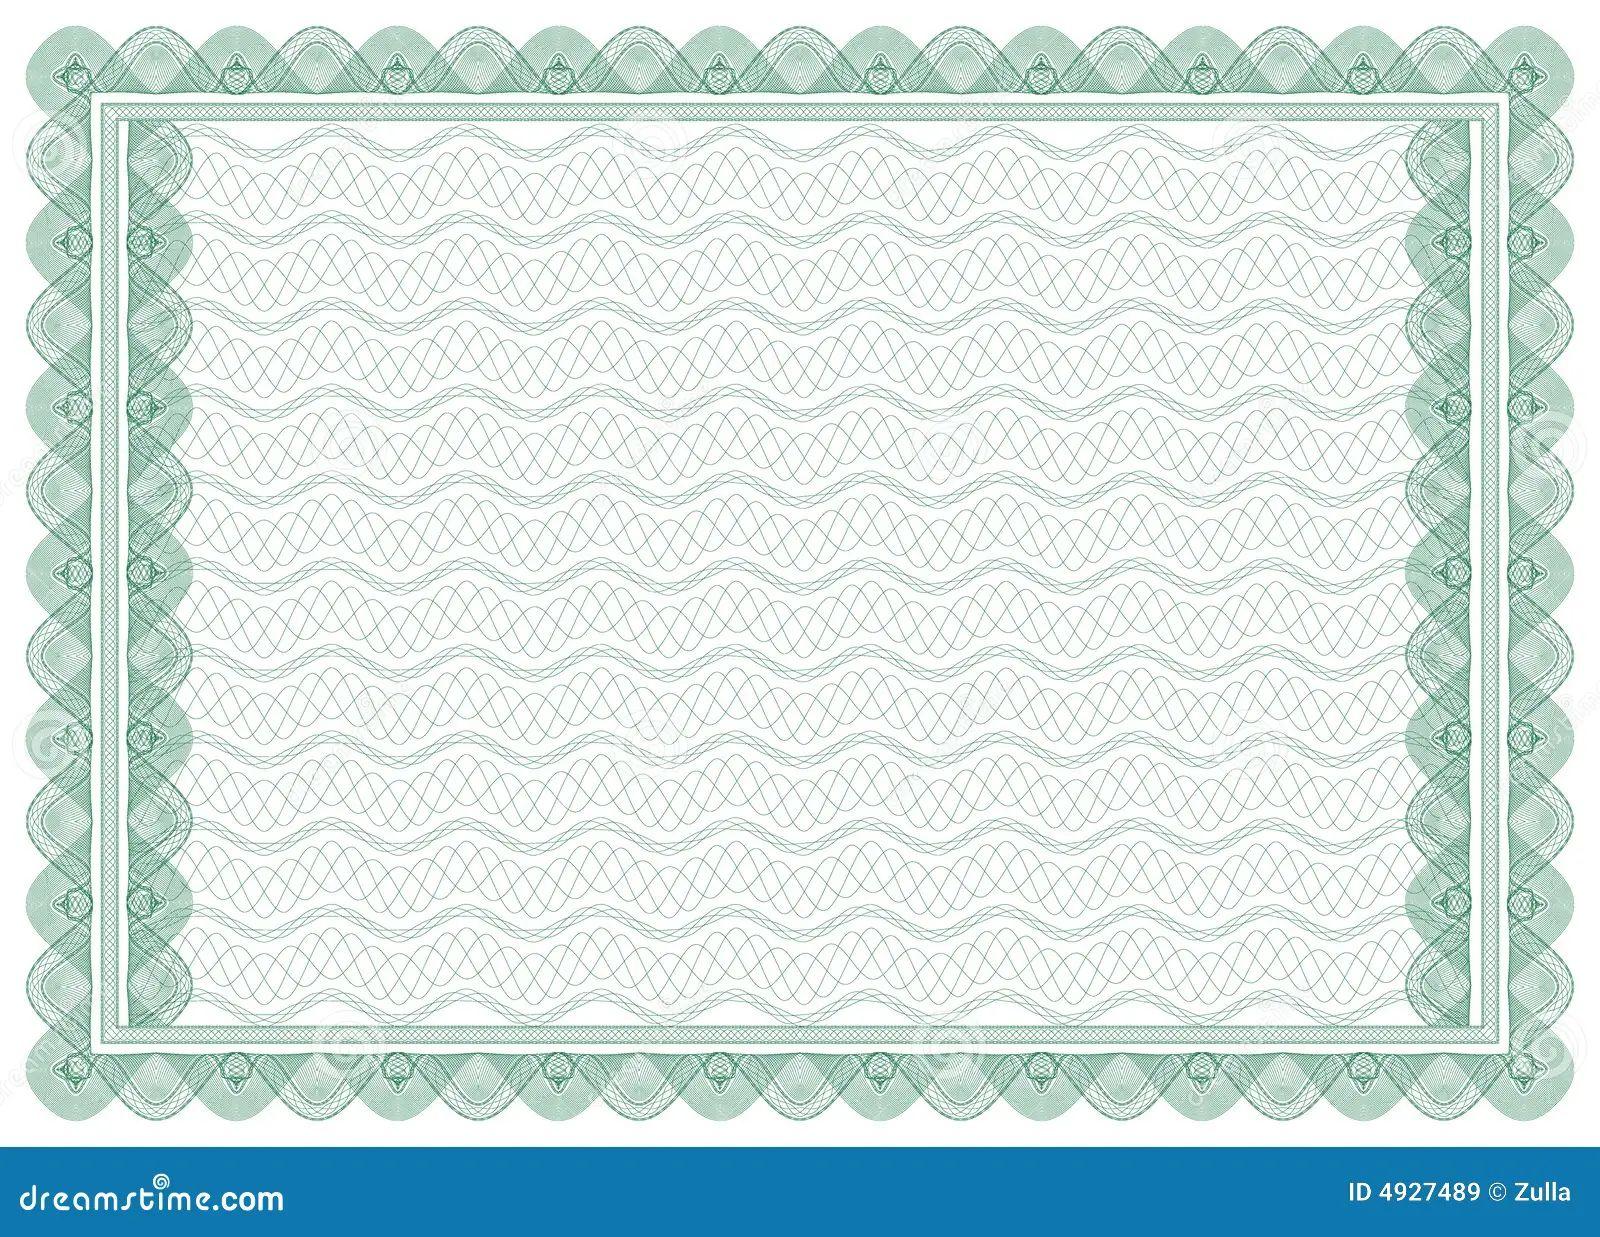 Certificate Borders Vector It Resume student resume templates free – Certificate Borders Free Download